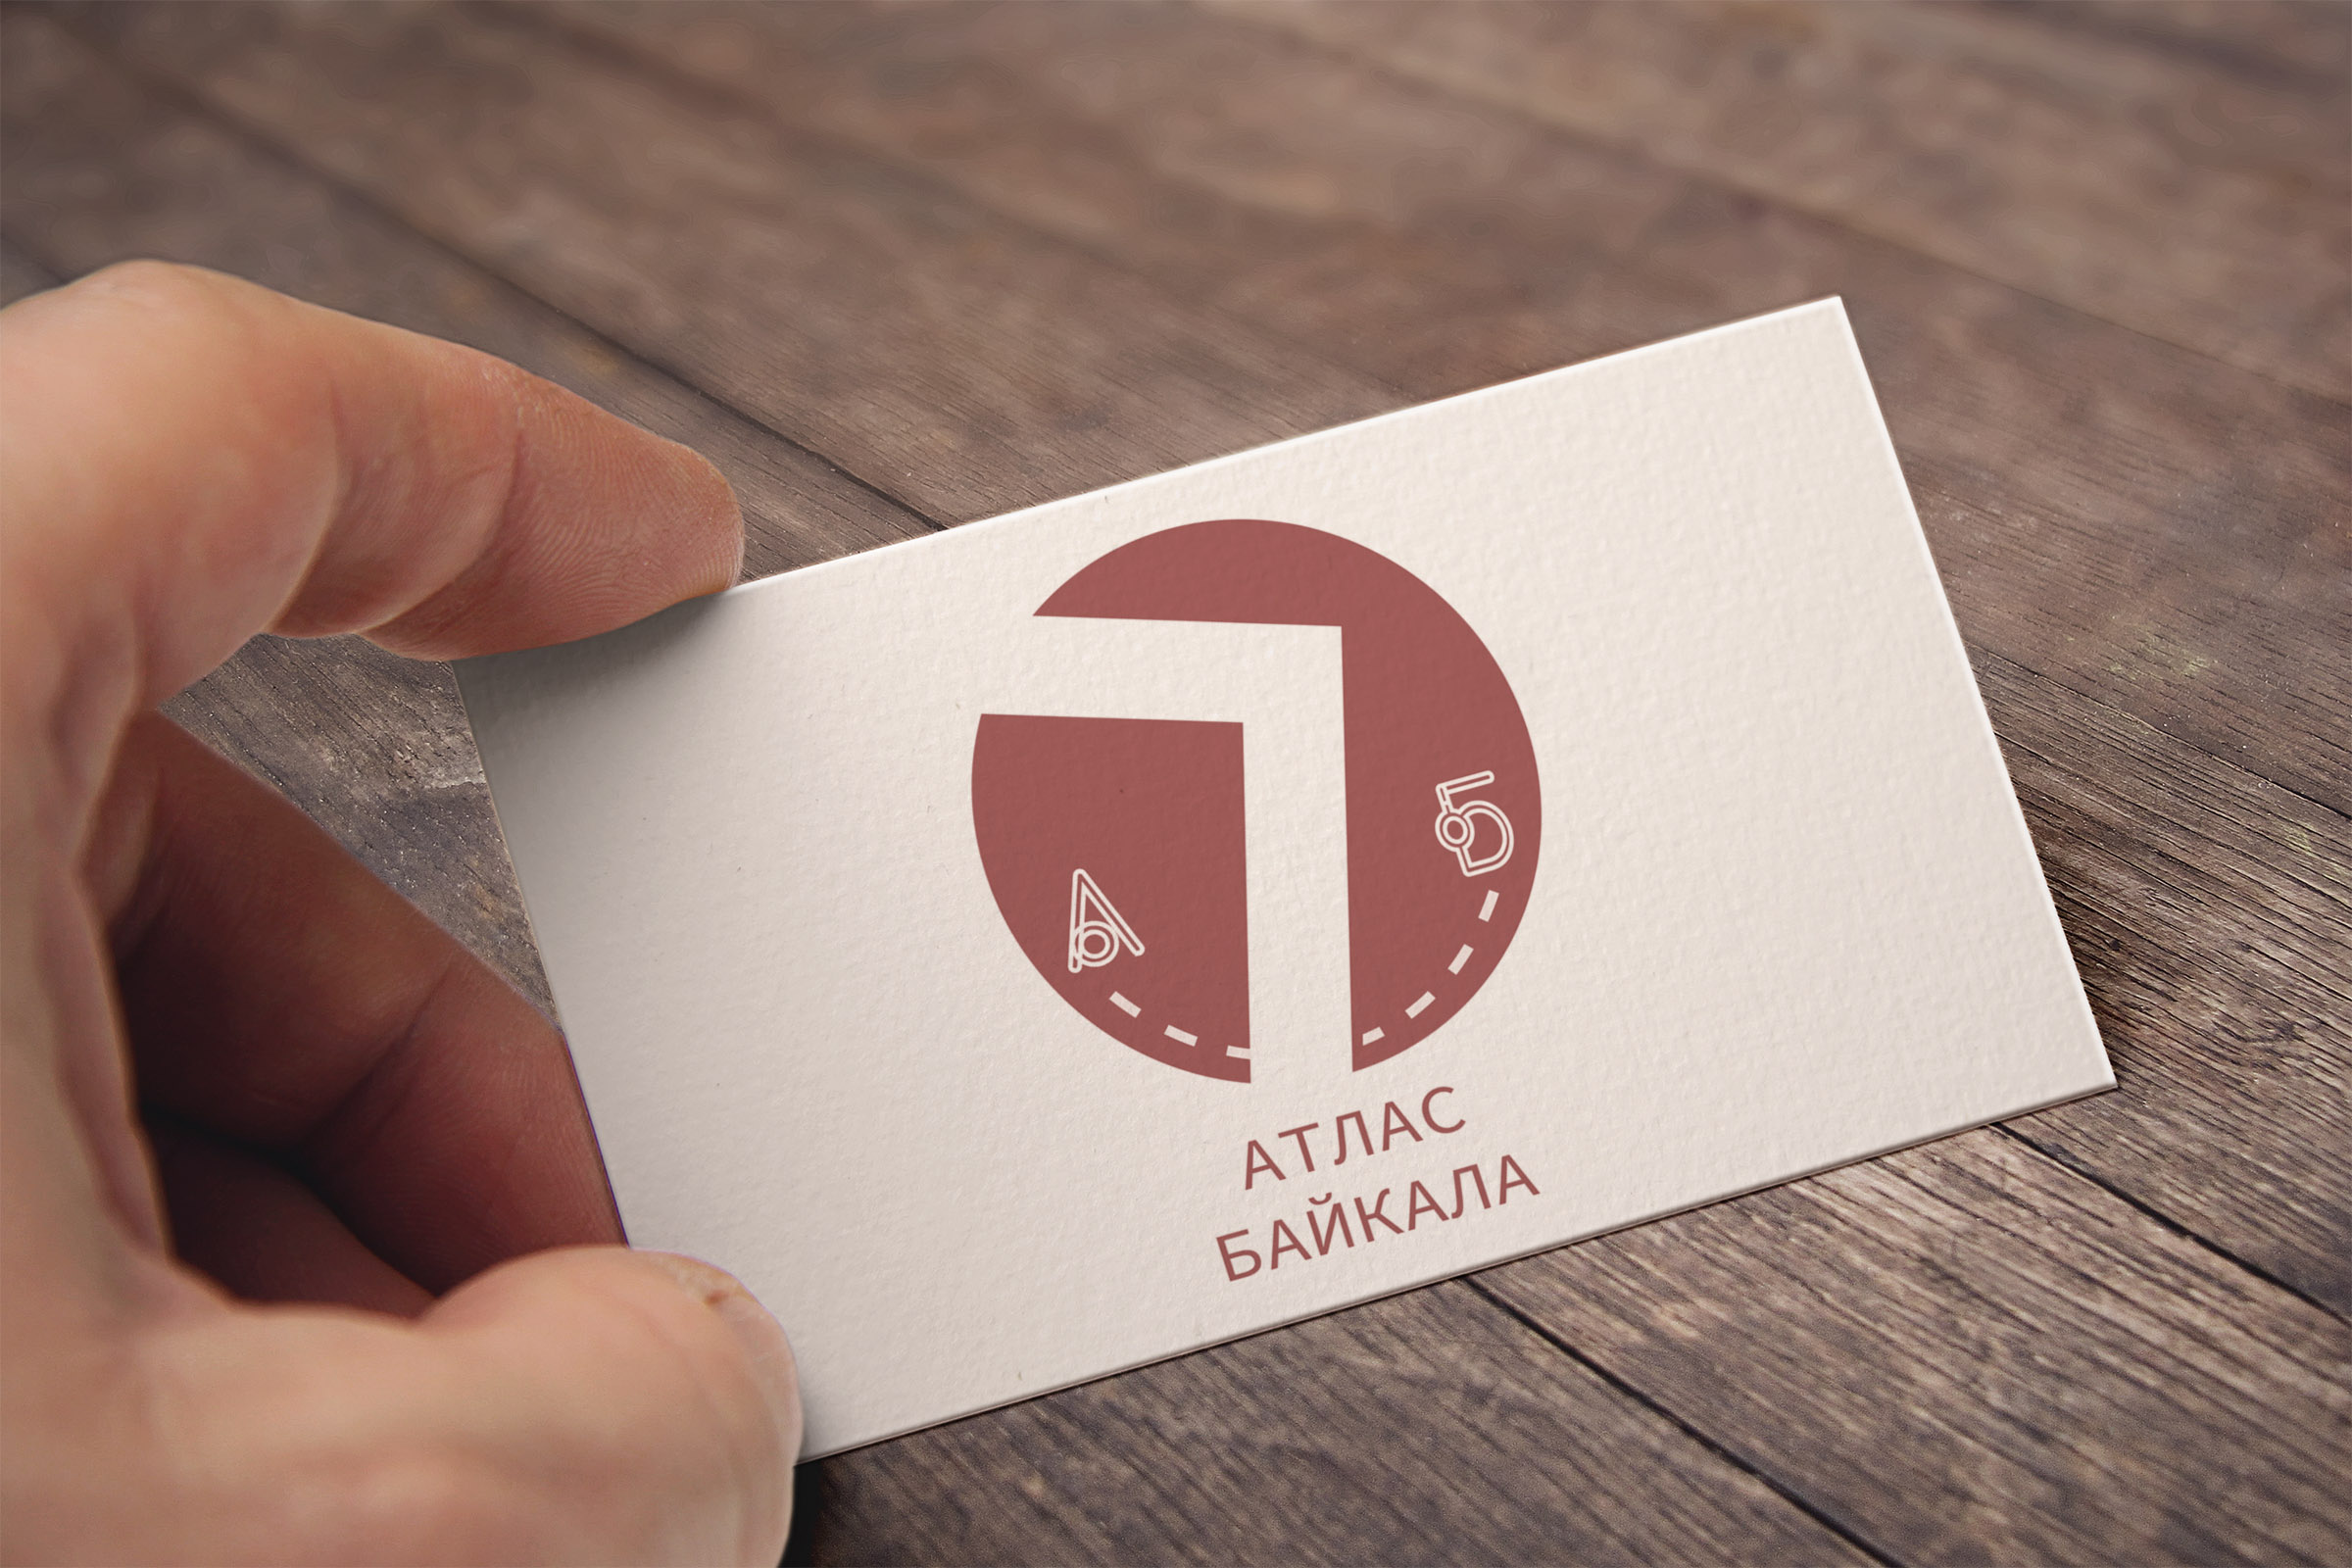 Разработка логотипа Атлас Байкала фото f_4125b1ad2b86157a.jpg